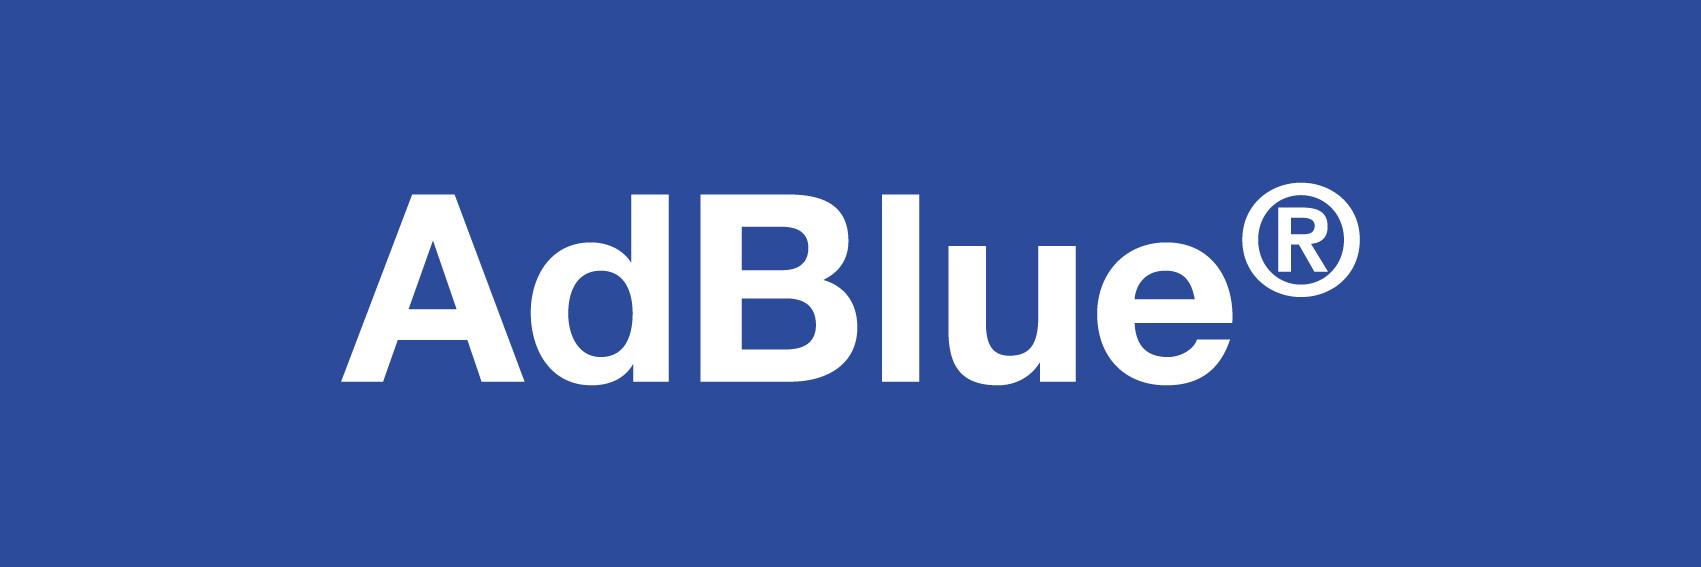 Ad Blue.jpg